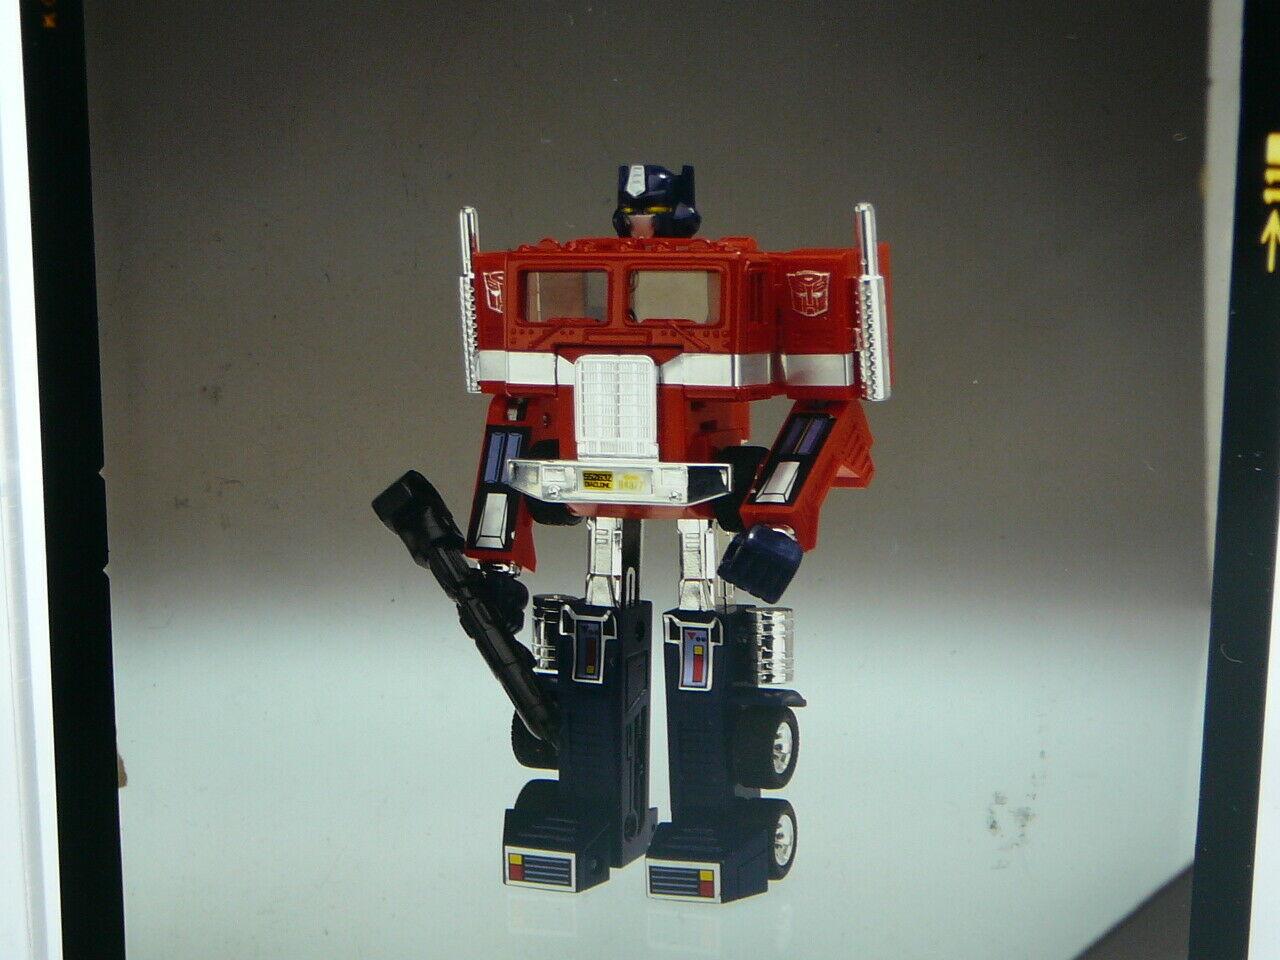 Képgaléria: Belsős G1 Transformers prototípus képek II.